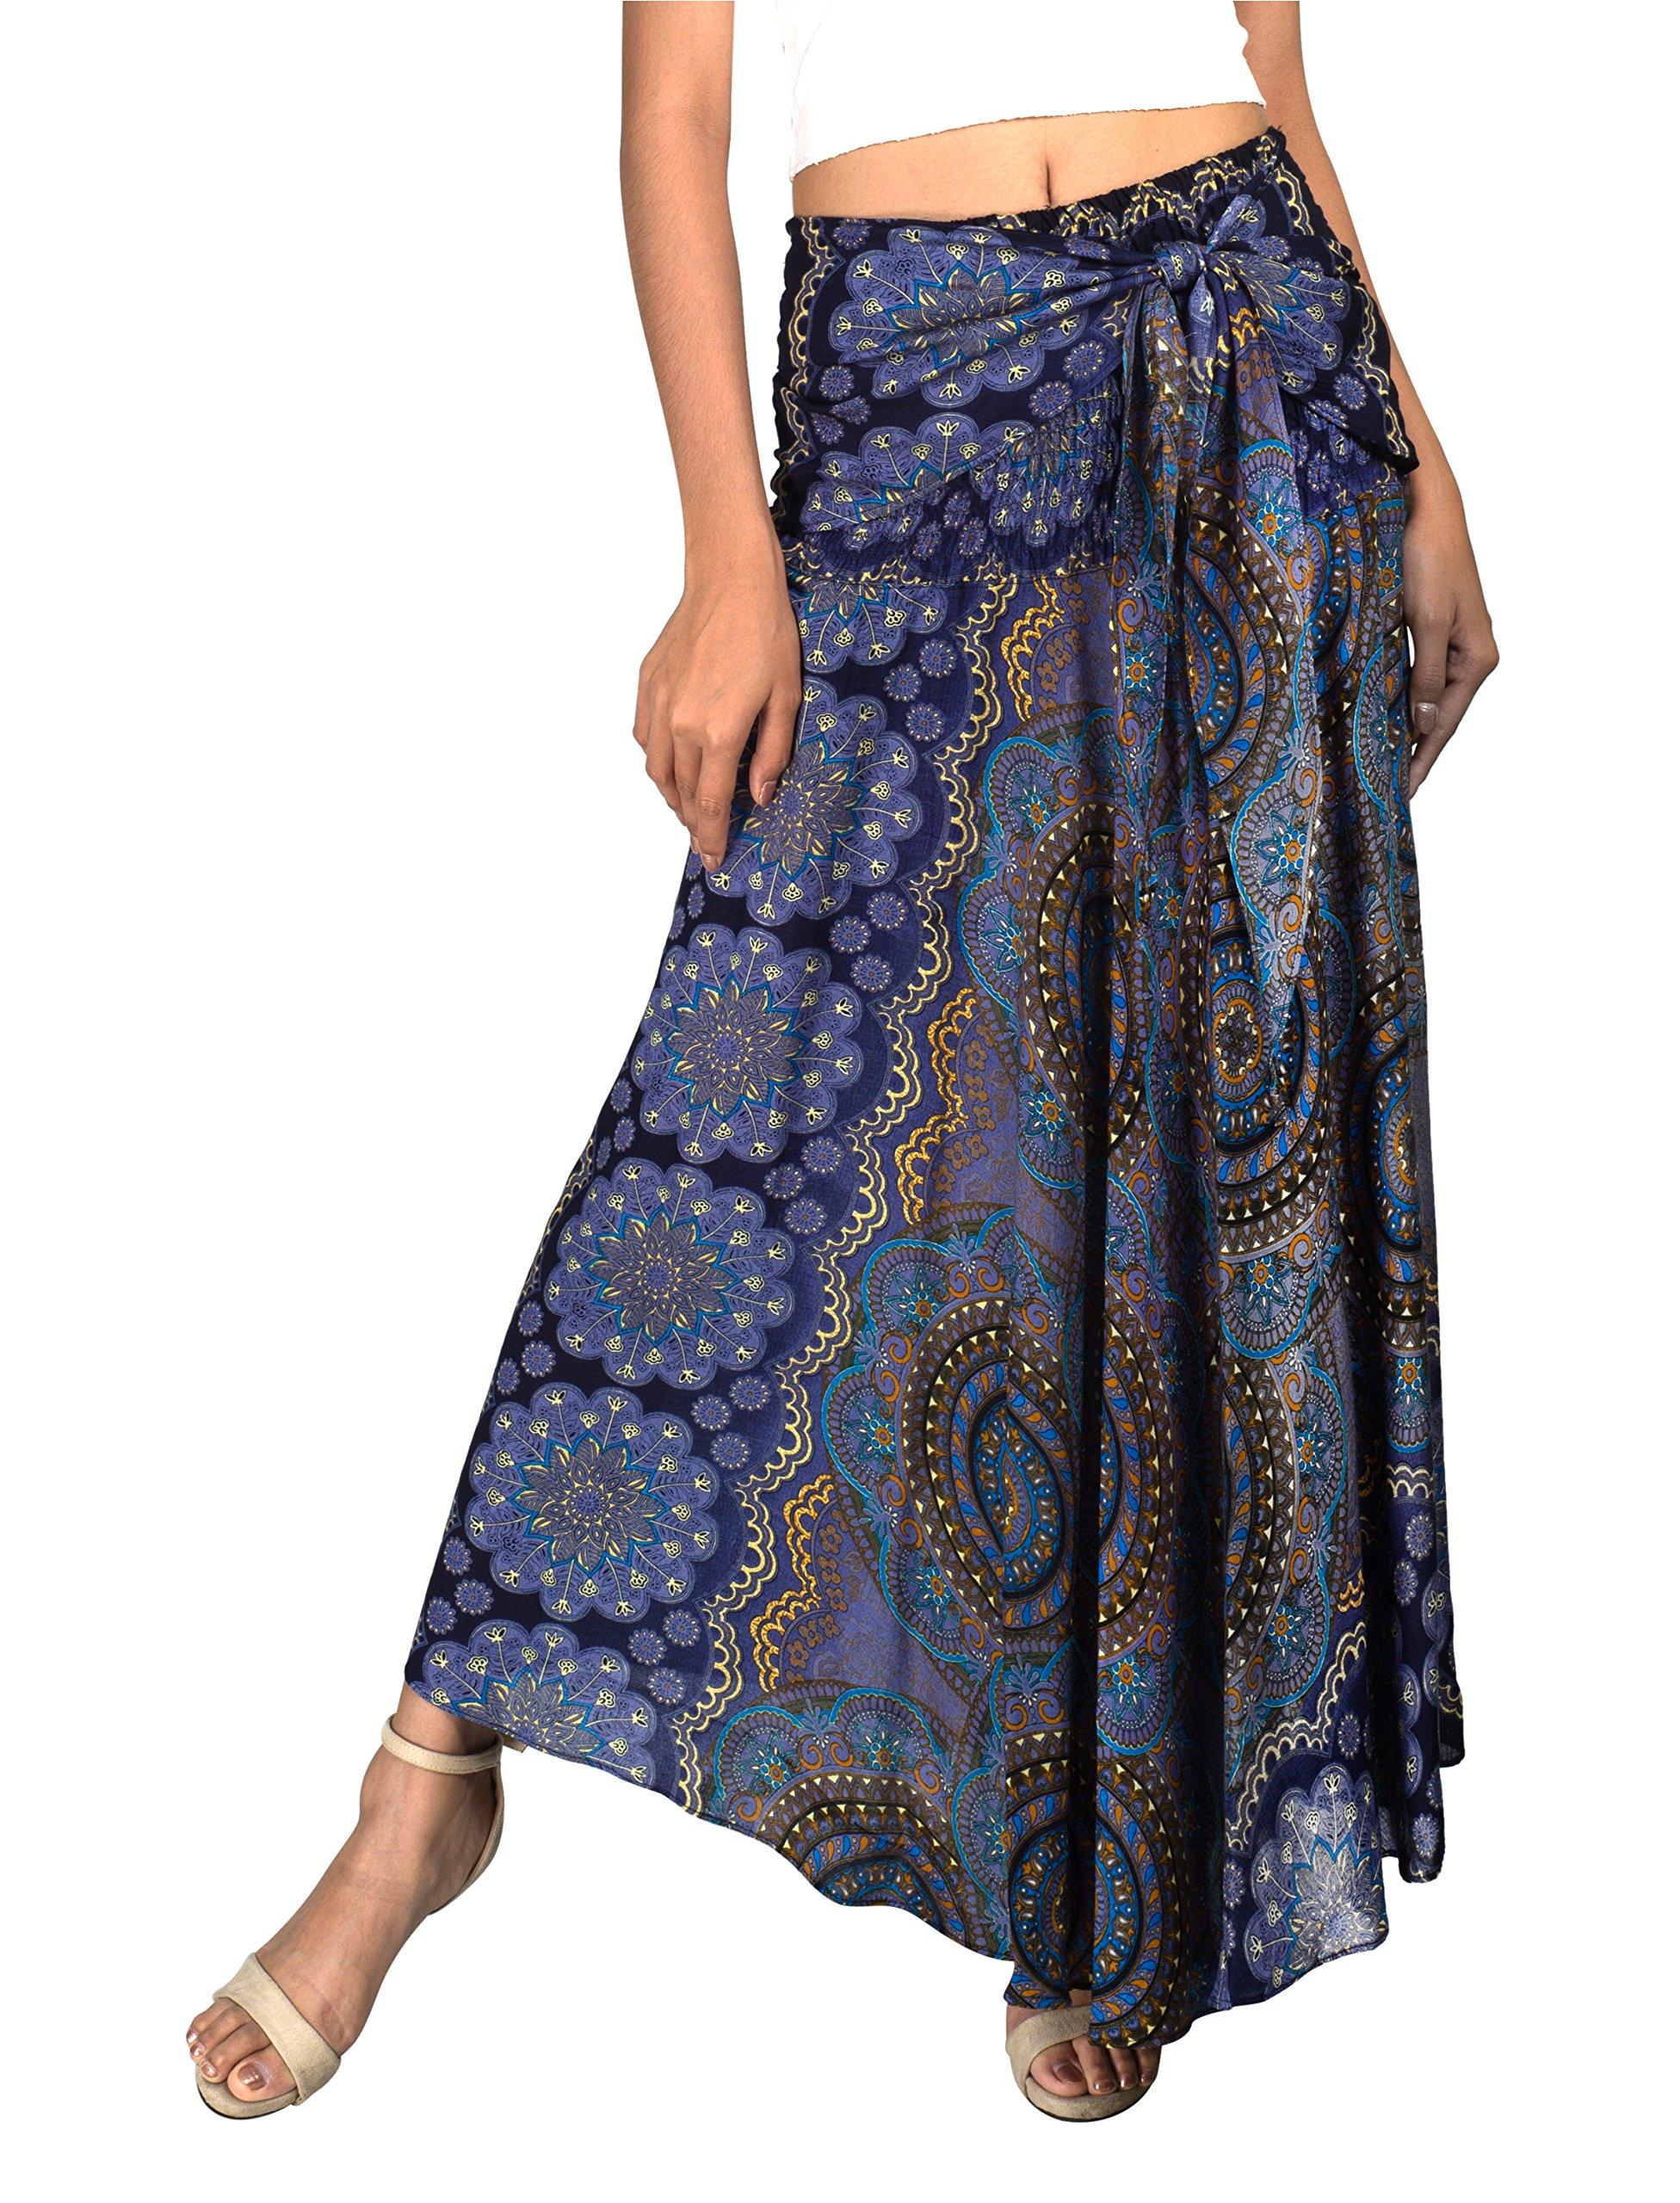 Joop Joop Maxi Bohemian Loose Flowing Yoga Travel Beach Festival Lounge Skirt and Dress